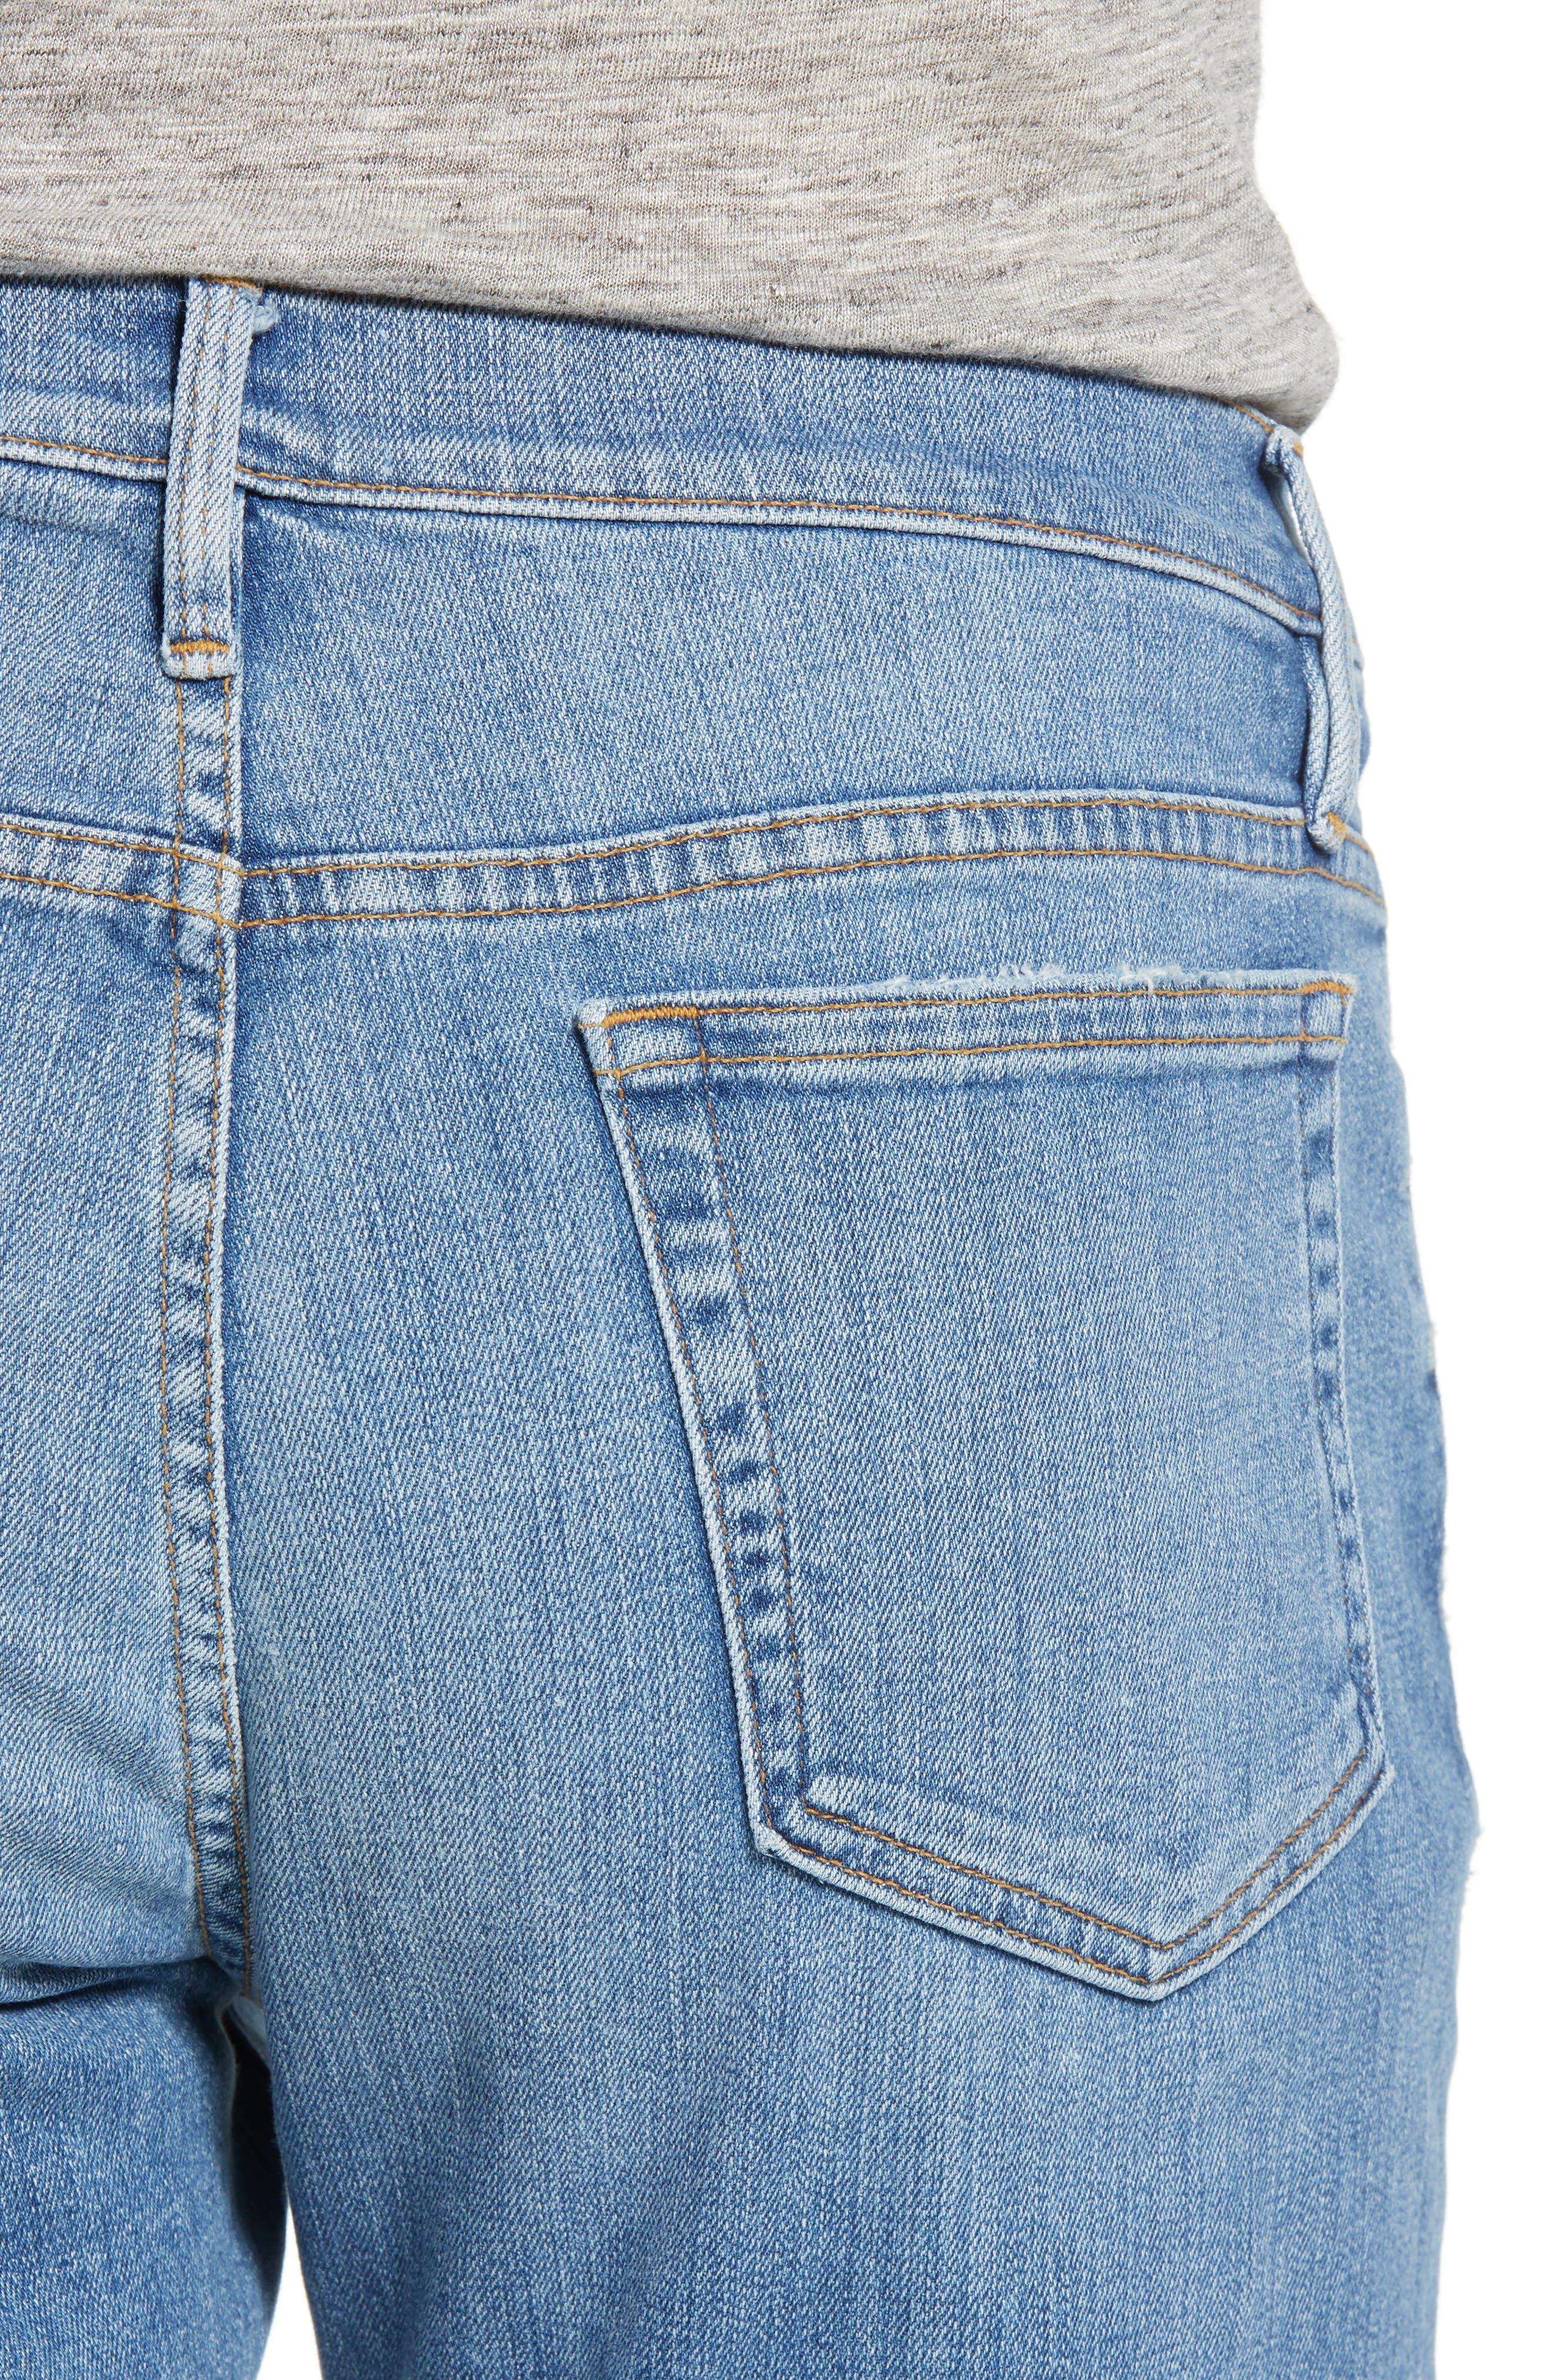 L'Homme Slim Straight Fit Jeans,                             Alternate thumbnail 4, color,                             Russel Cave